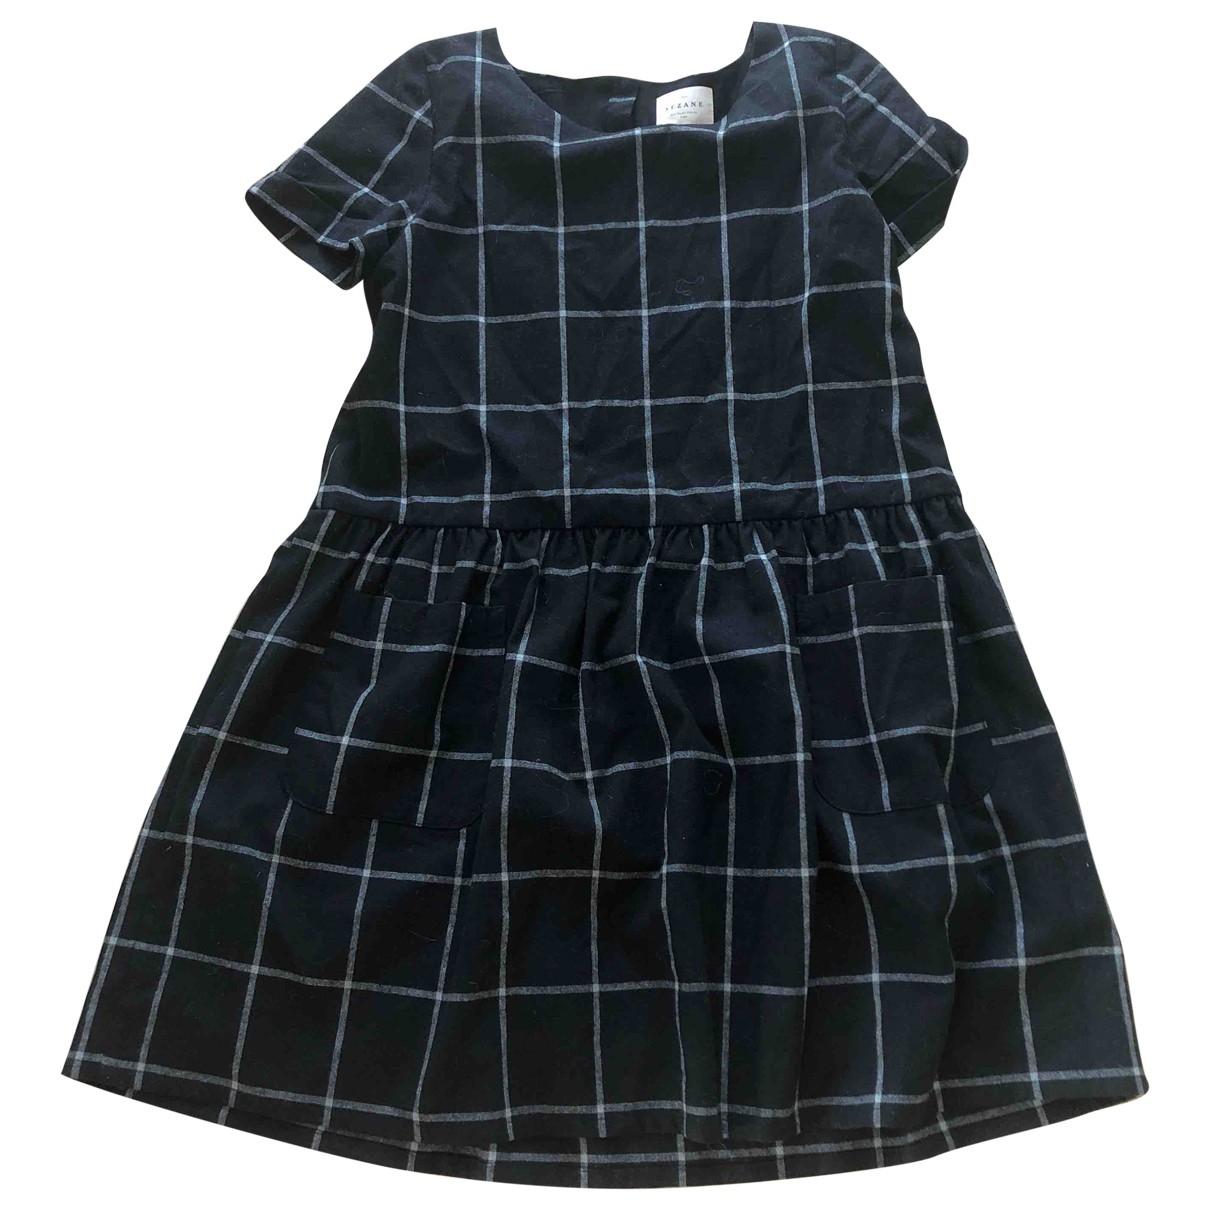 Sezane \N Kleid in  Grau Wolle